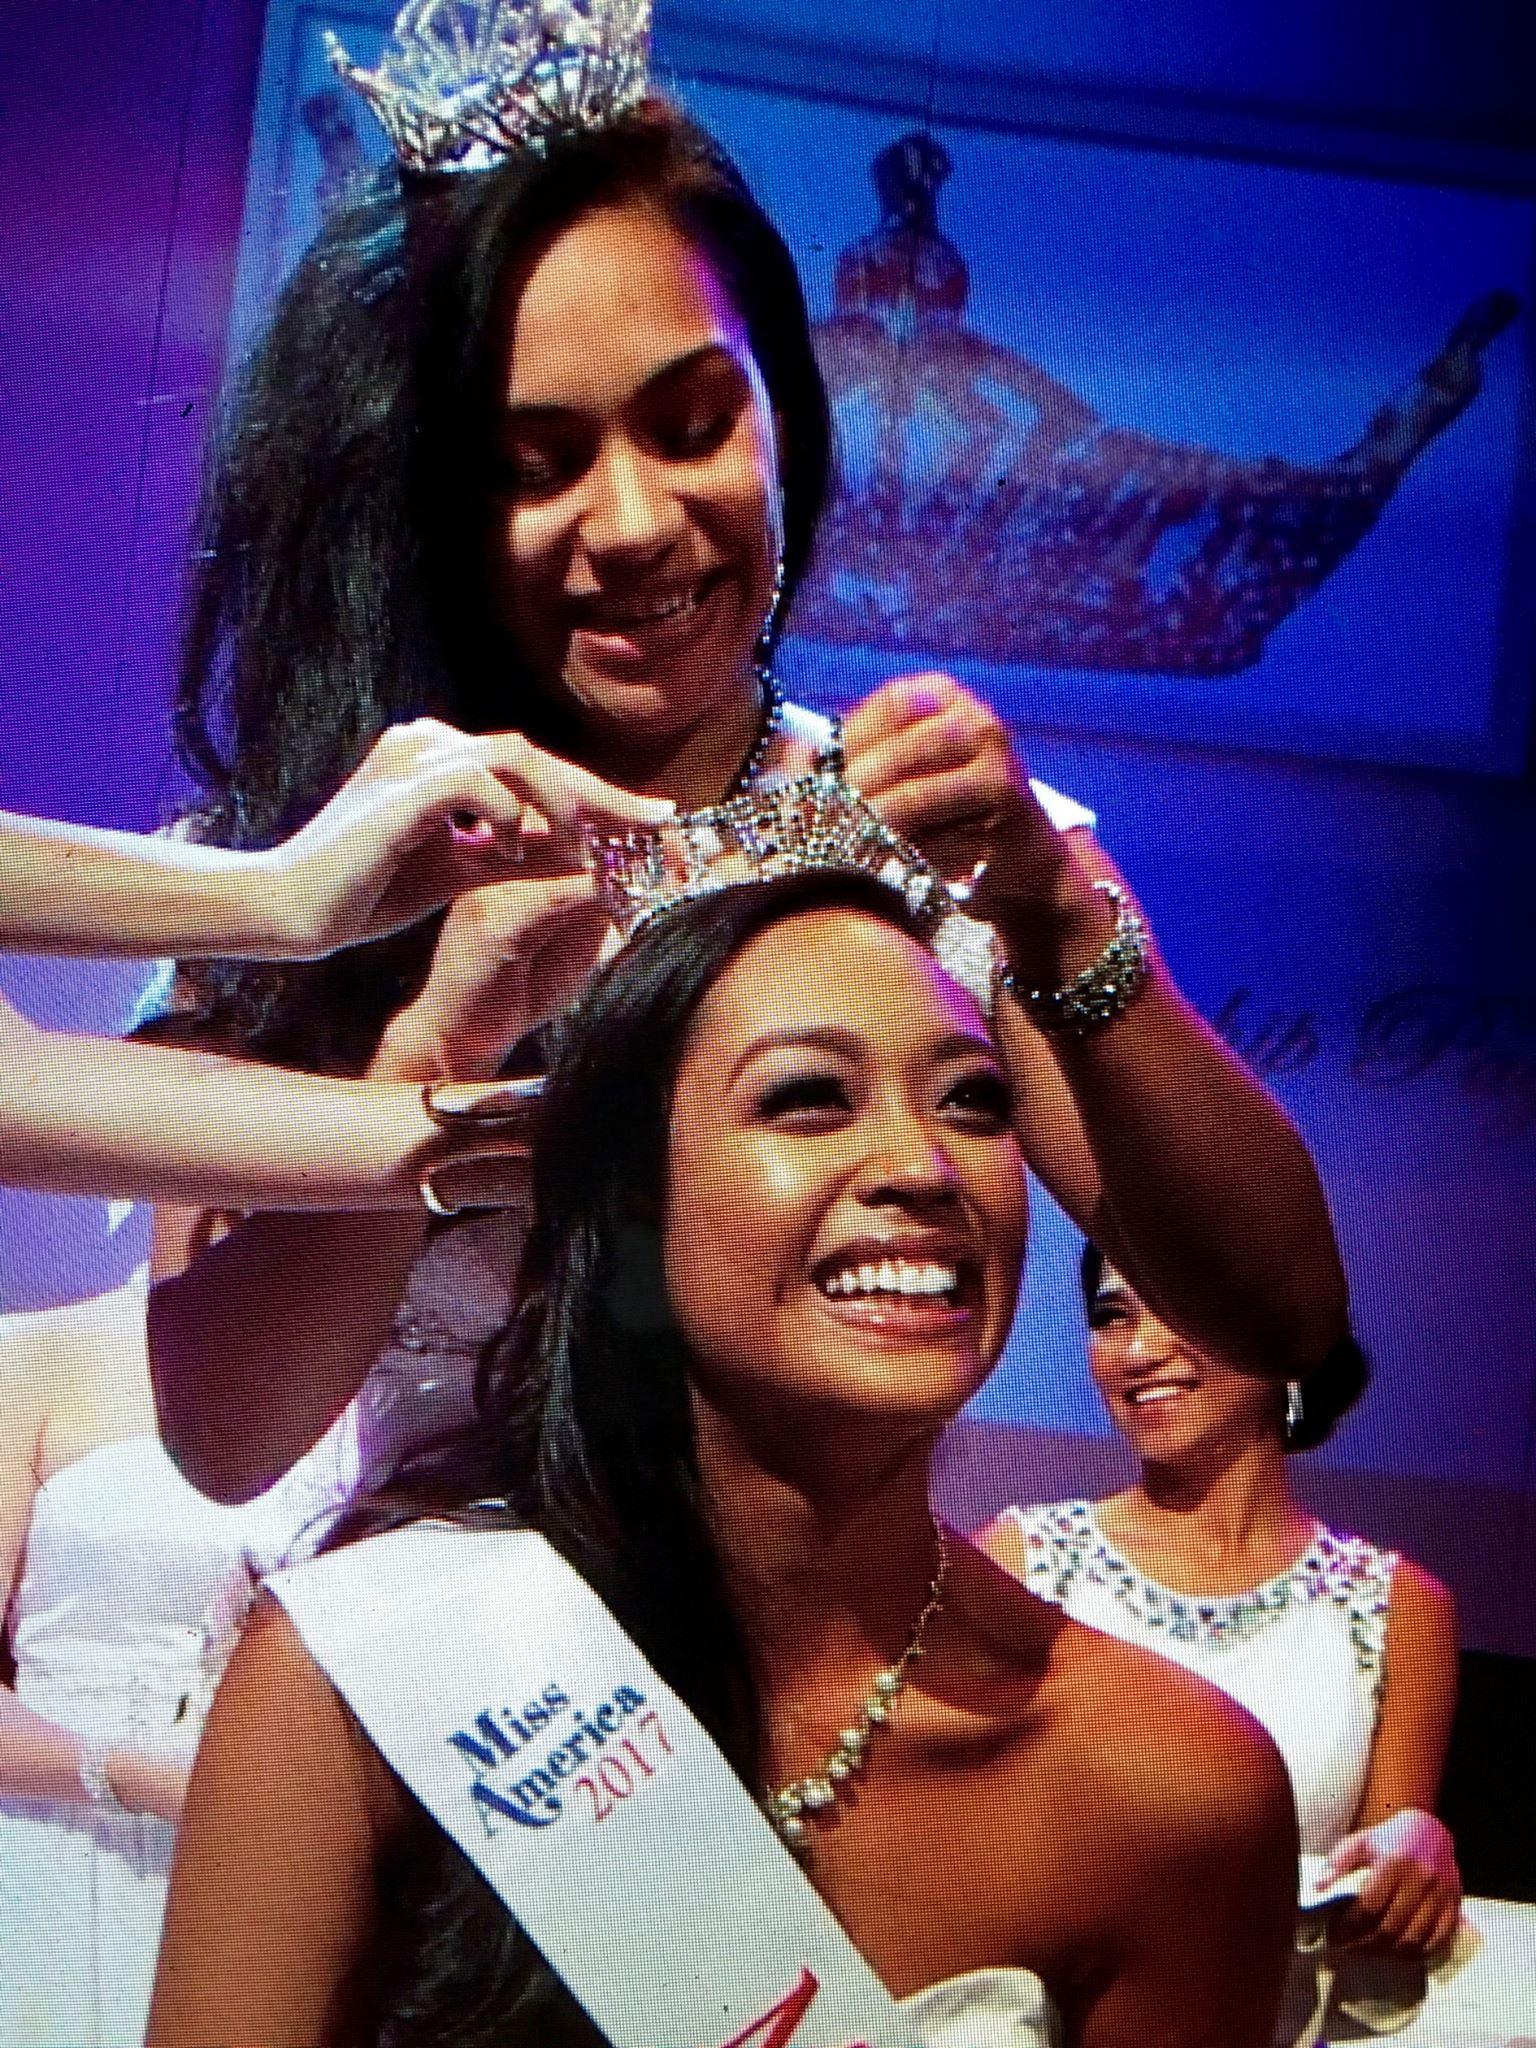 Miss Maui 2017 Casey Sales-Salcedo. PC: Miss Maui Organization